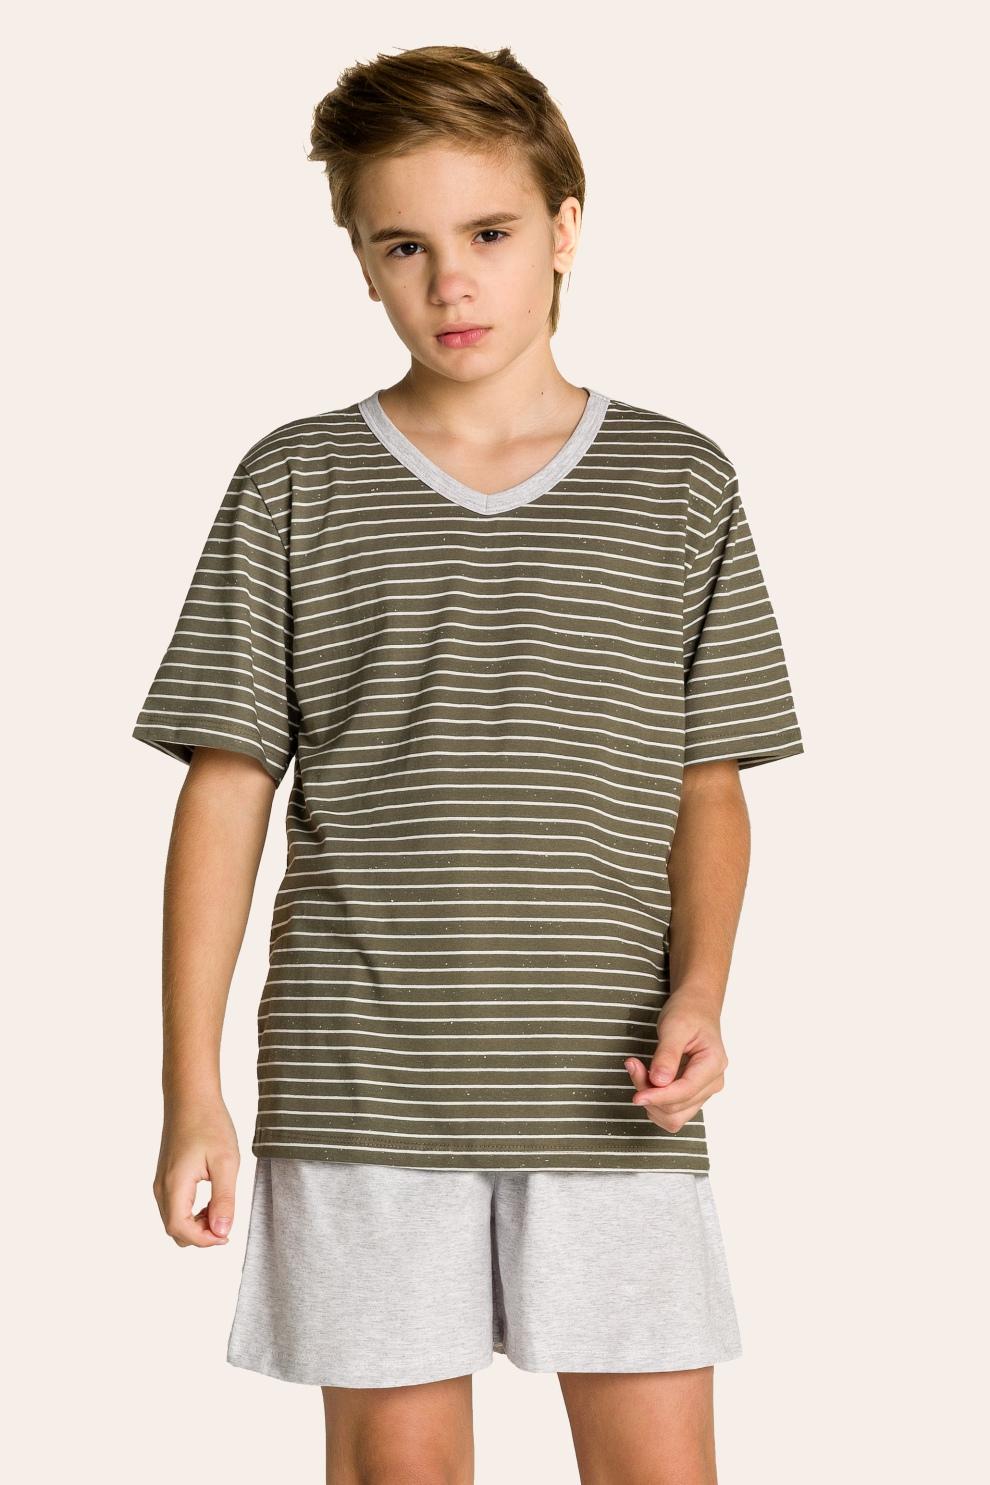 134/B - Pijama Juvenil Masculino Pai e Filhos Botonê Listrado